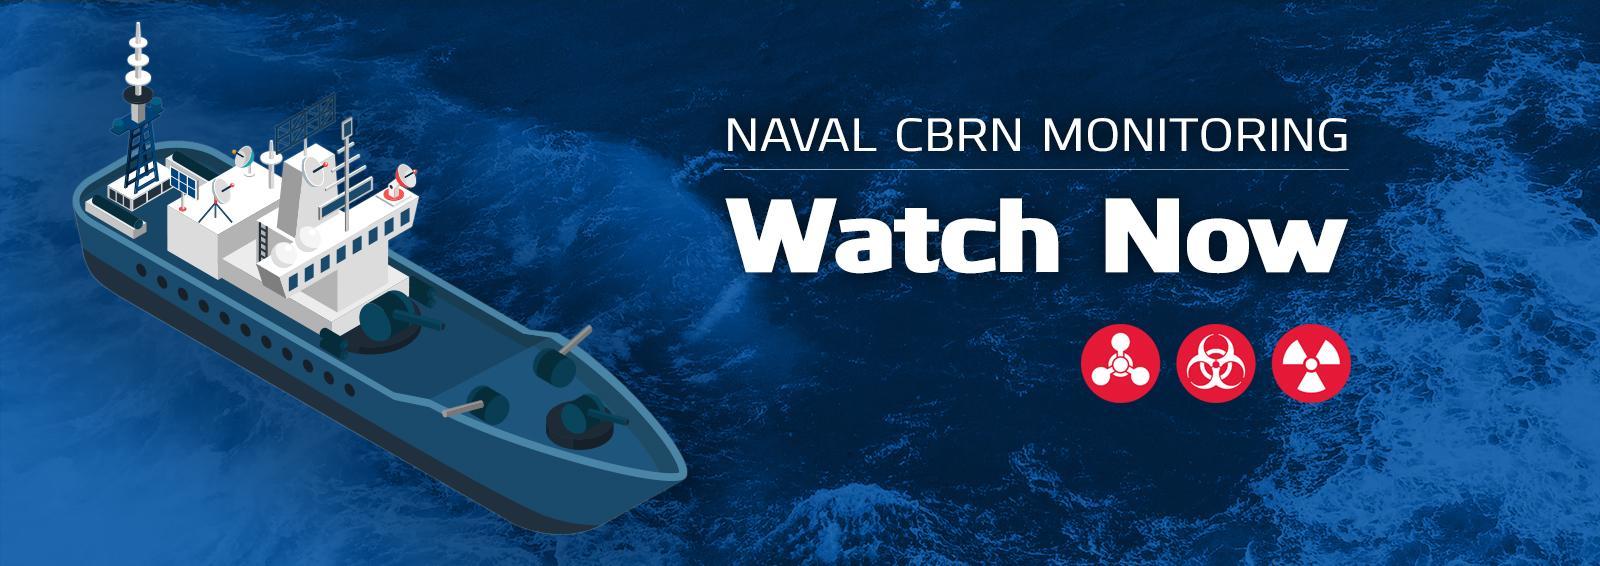 Naval CBRN Monitoring